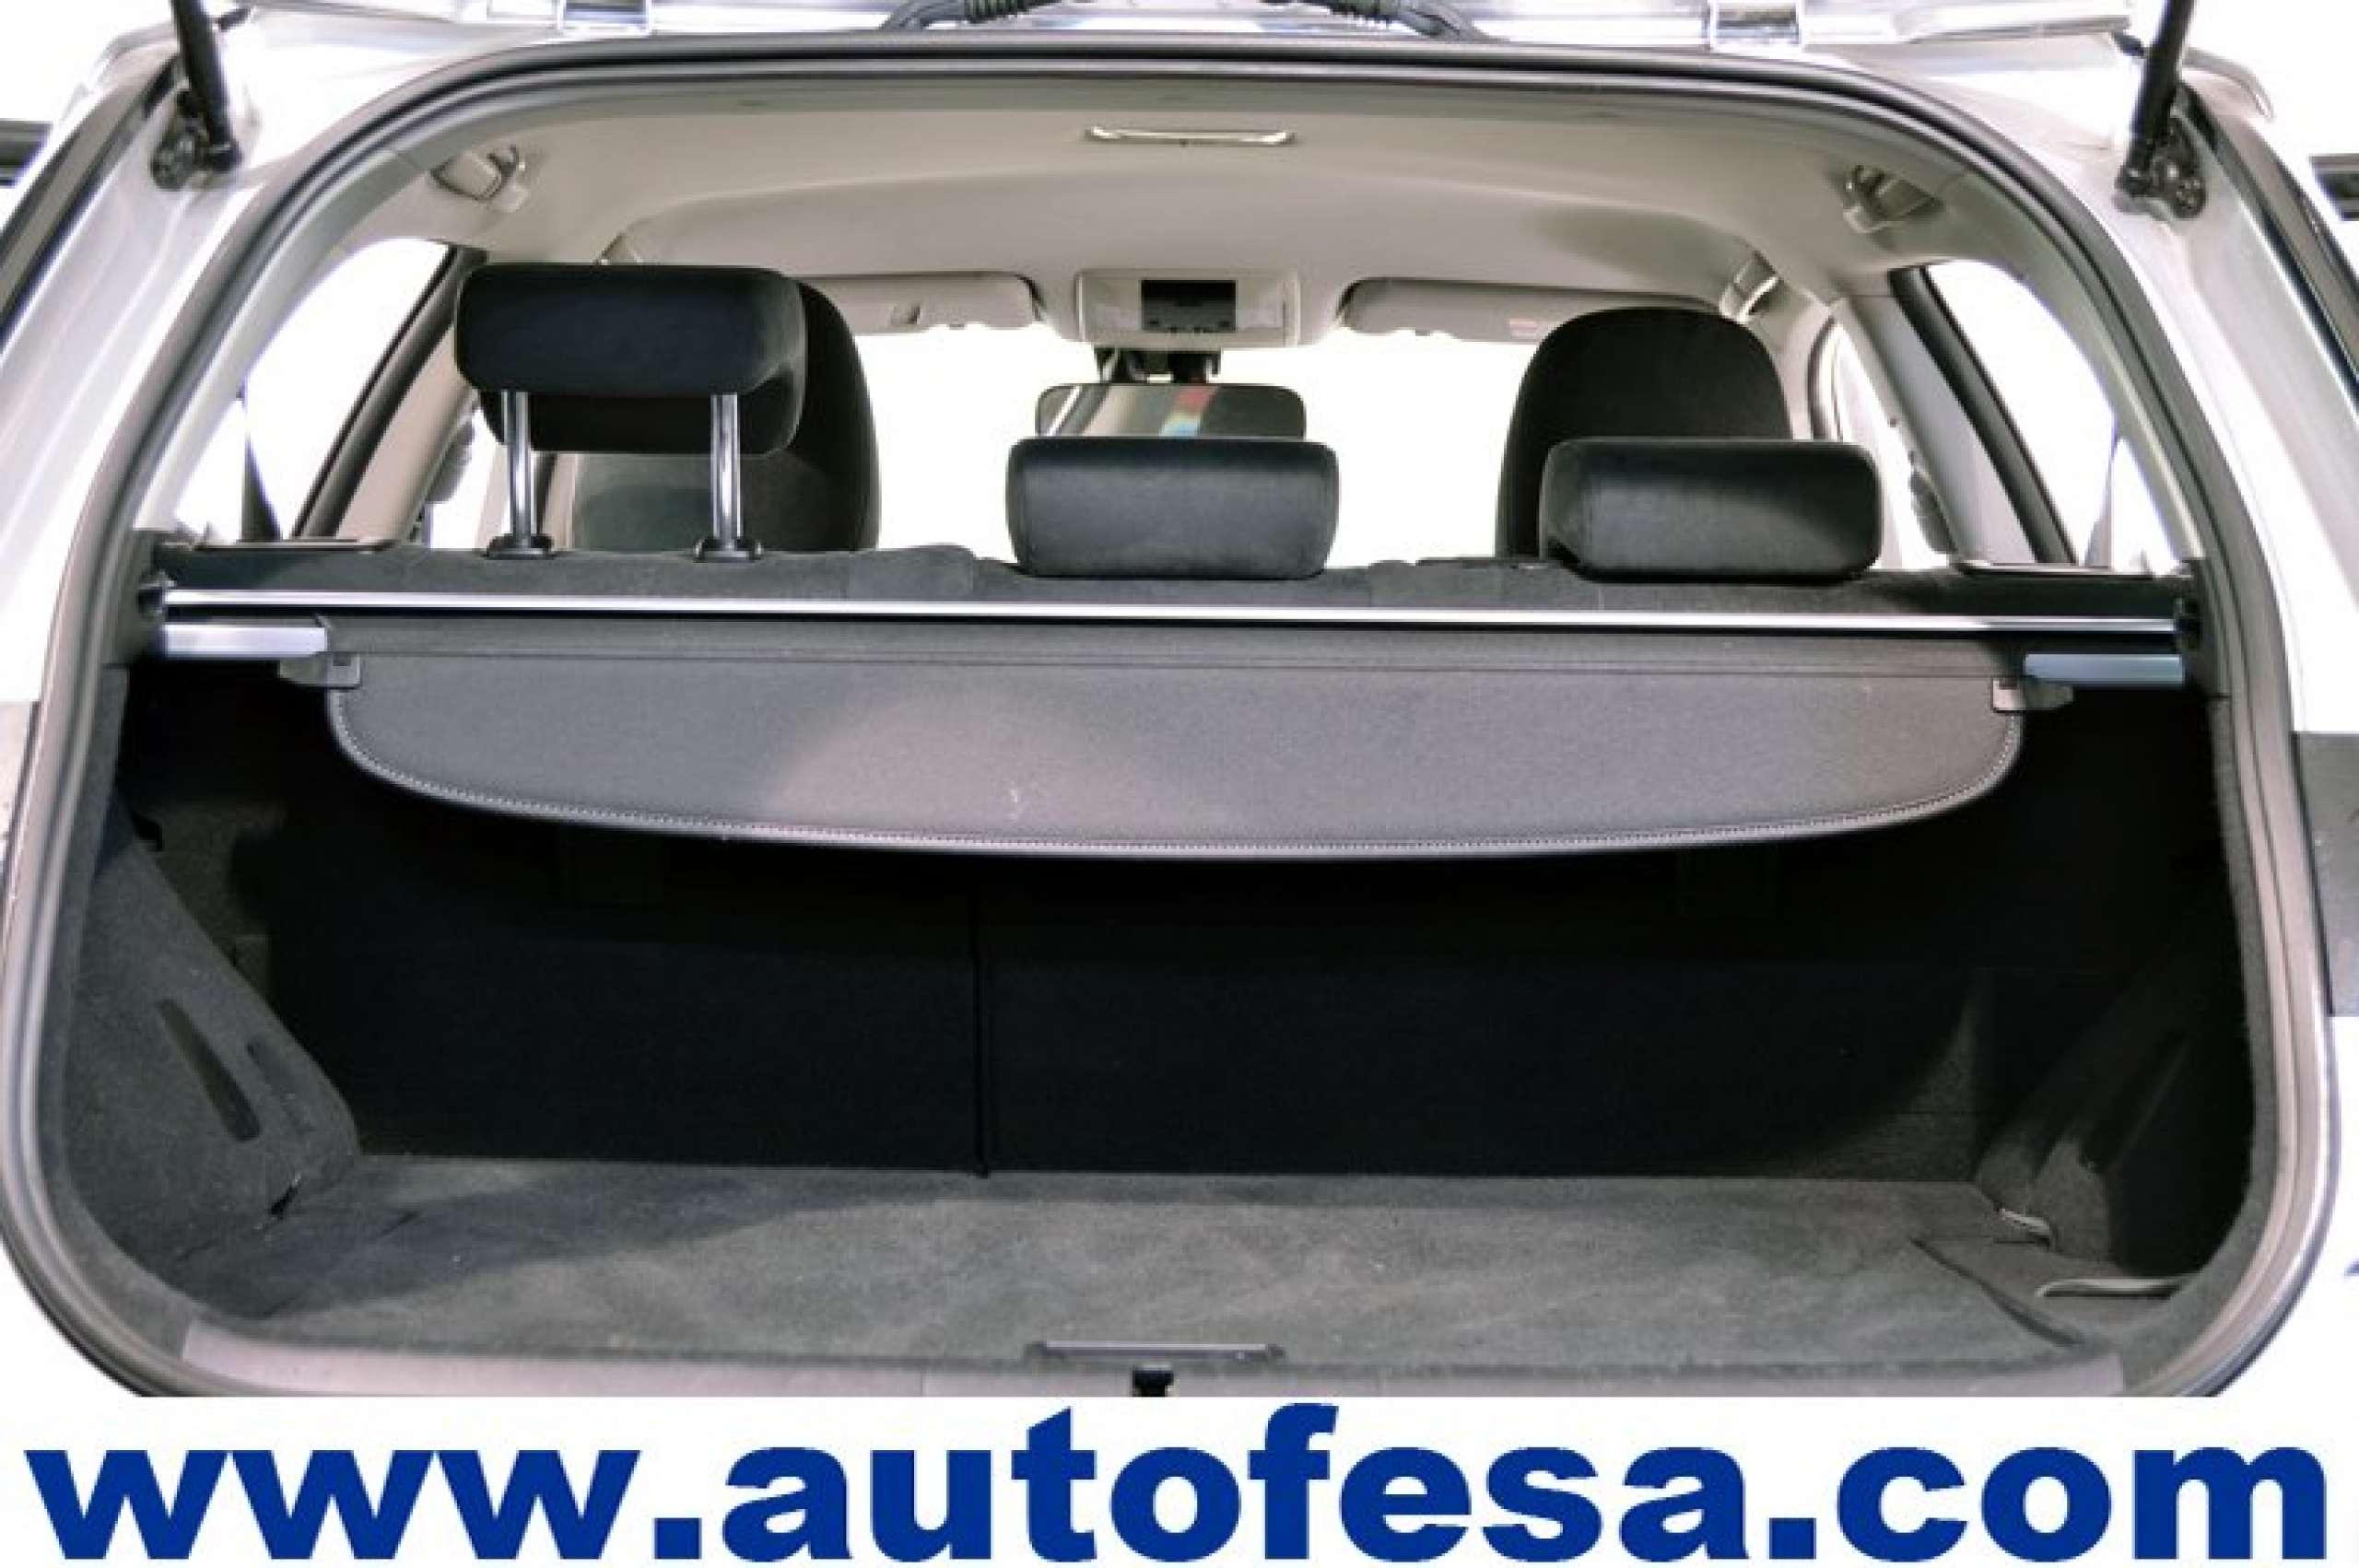 Lexus Ct 200h 1.8 136cv Eco Auto 5p - Foto 17